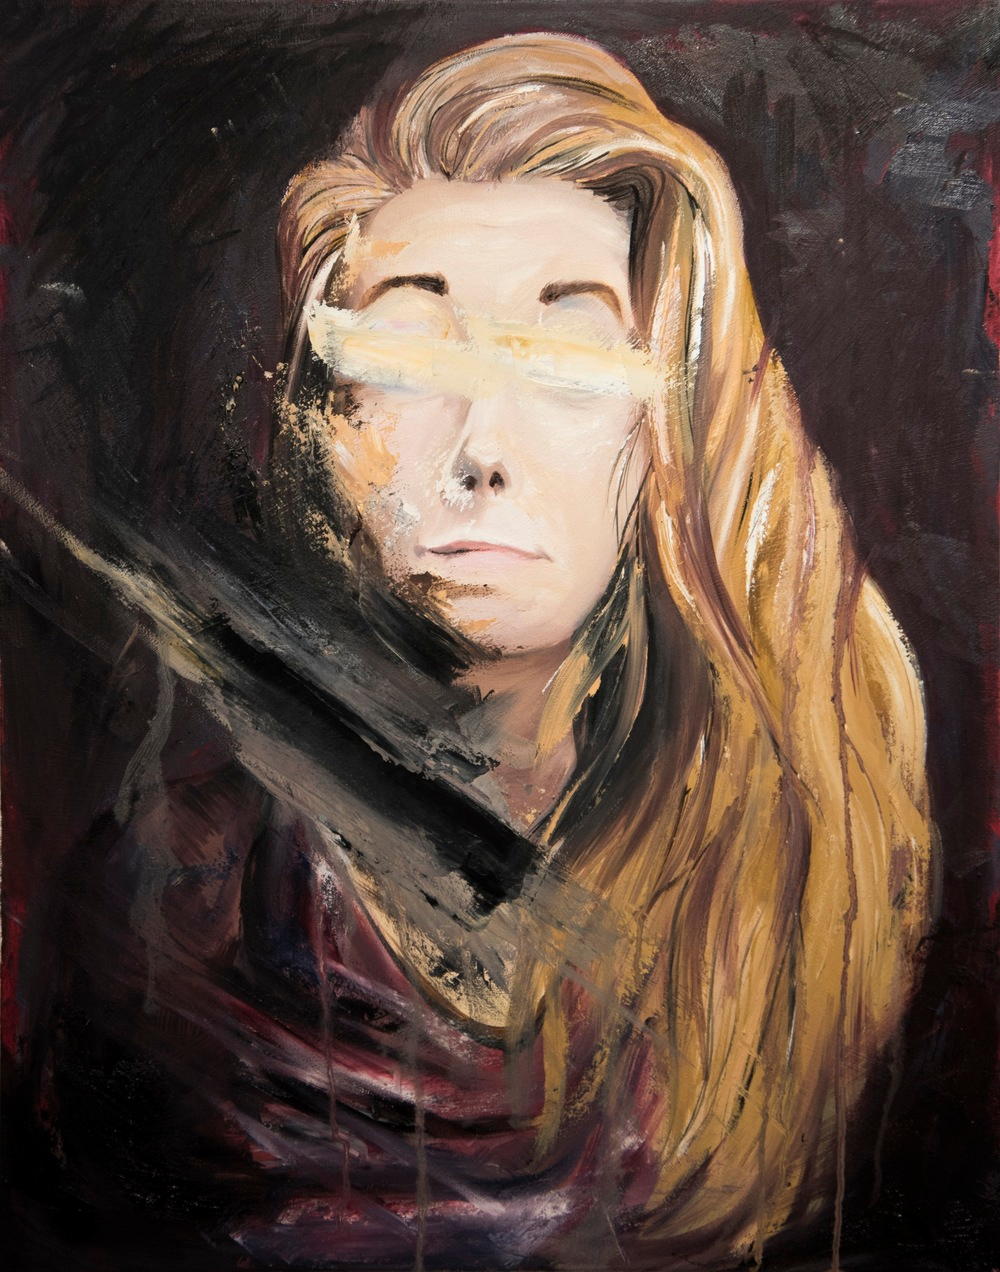 Self-portrait by Ashton Leath